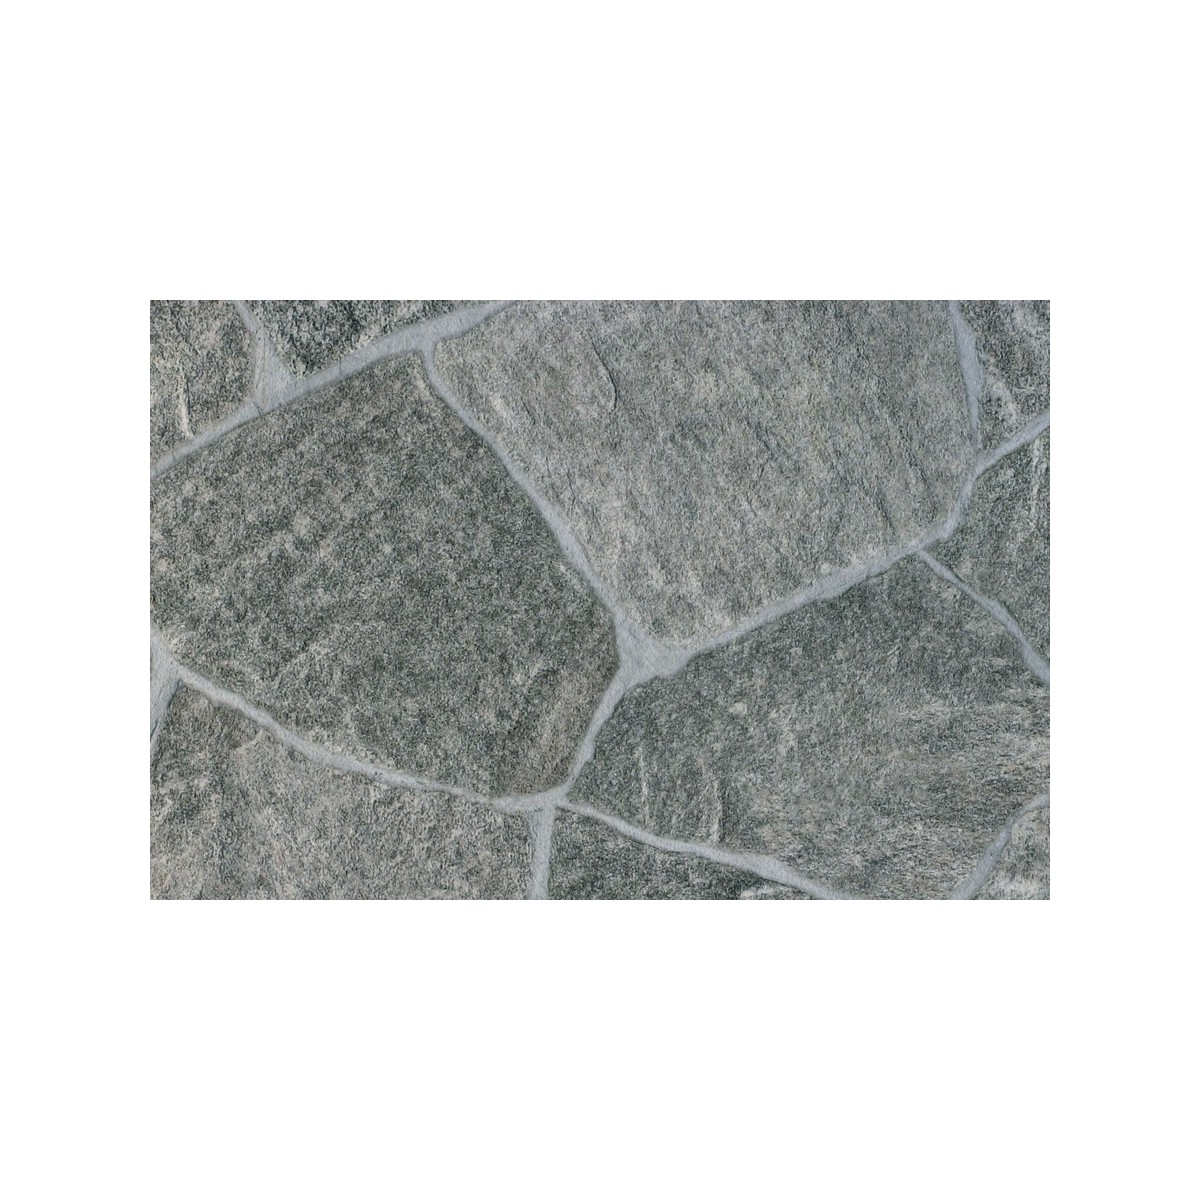 Vareprøve Gulvbelegg Texline Lys skifer 0618